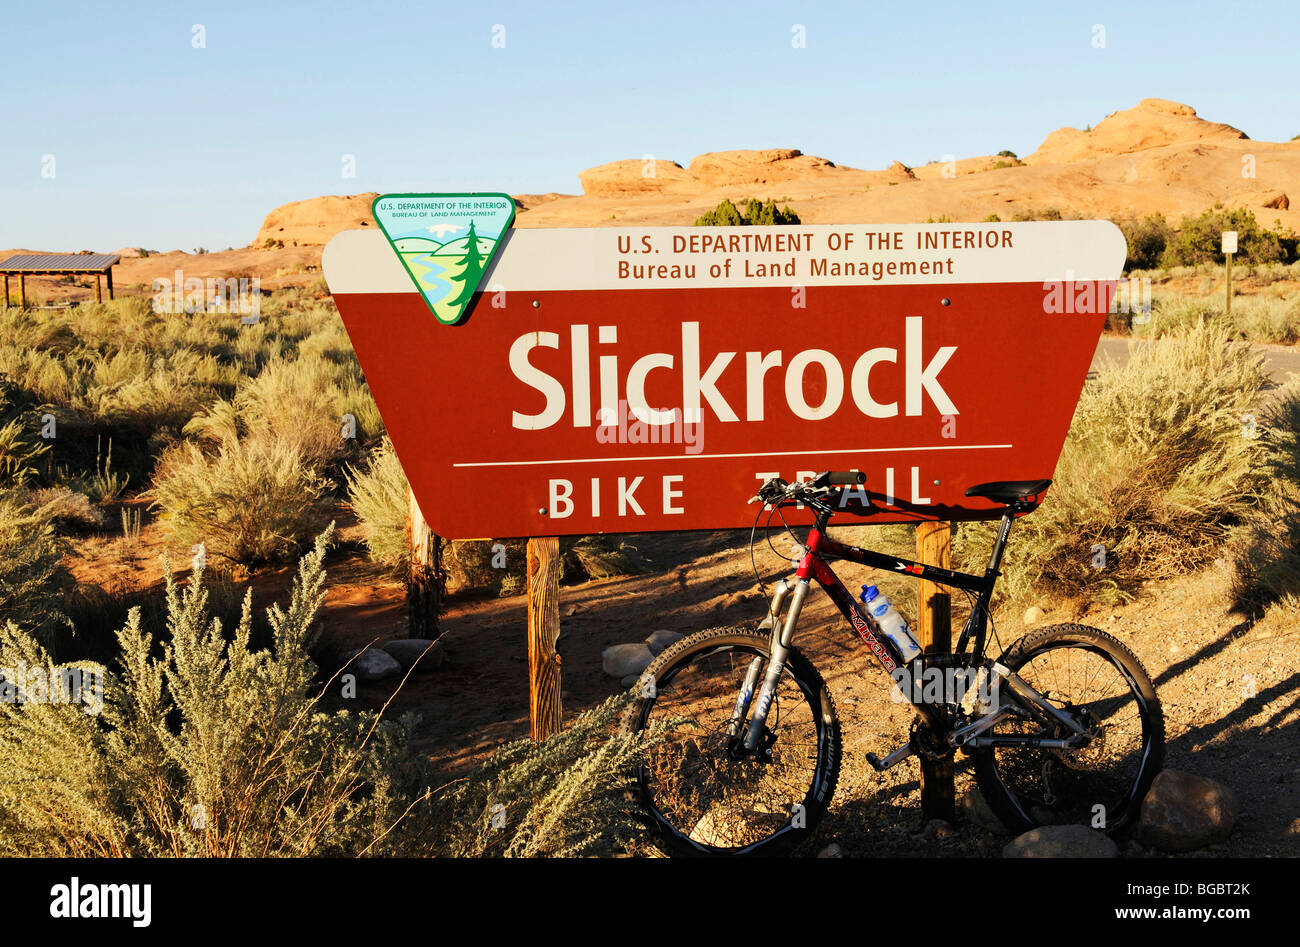 Slickrock Bike Trail, shield, Moab, Utah, USA - Stock Image